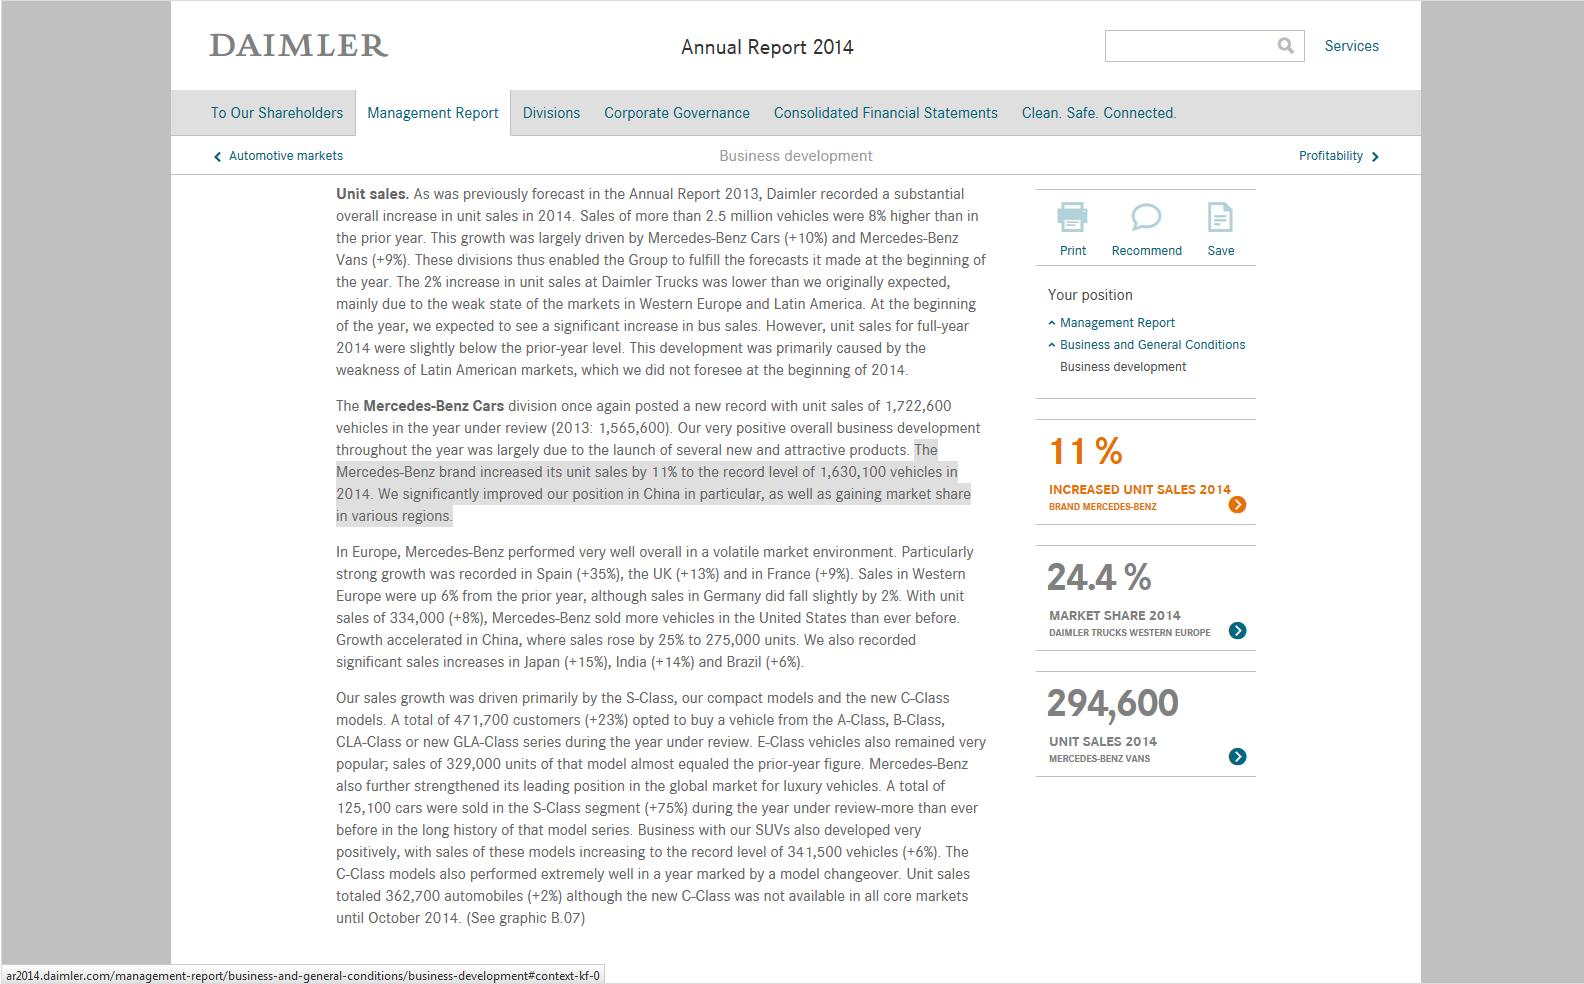 Daimler Annual Report 2014